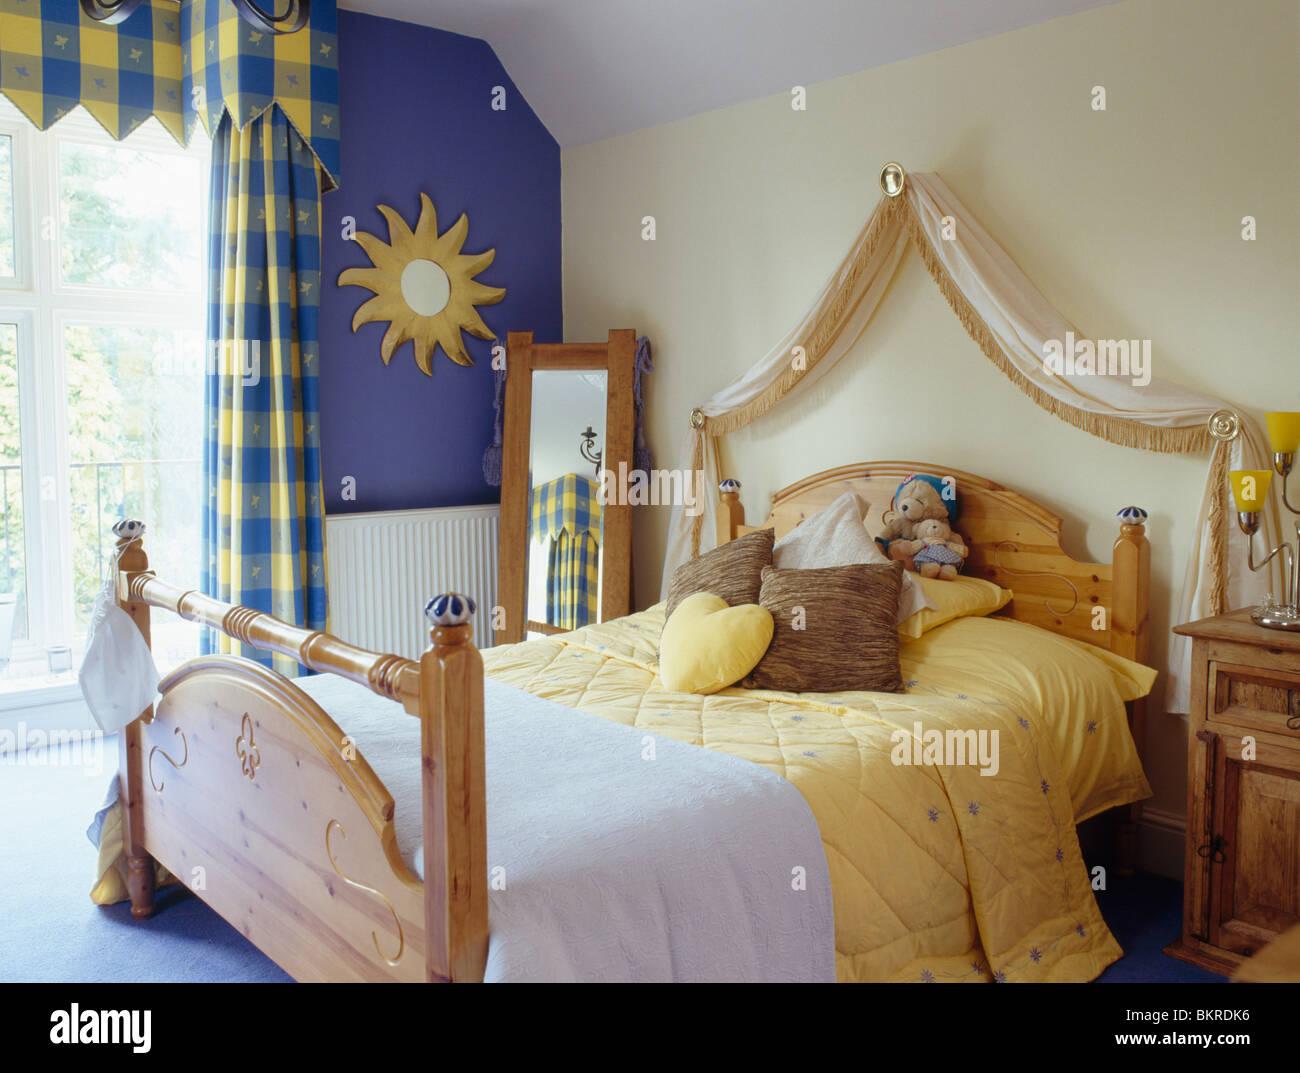 Schlafzimmer blaue wand - Blaue wand schlafzimmer ...